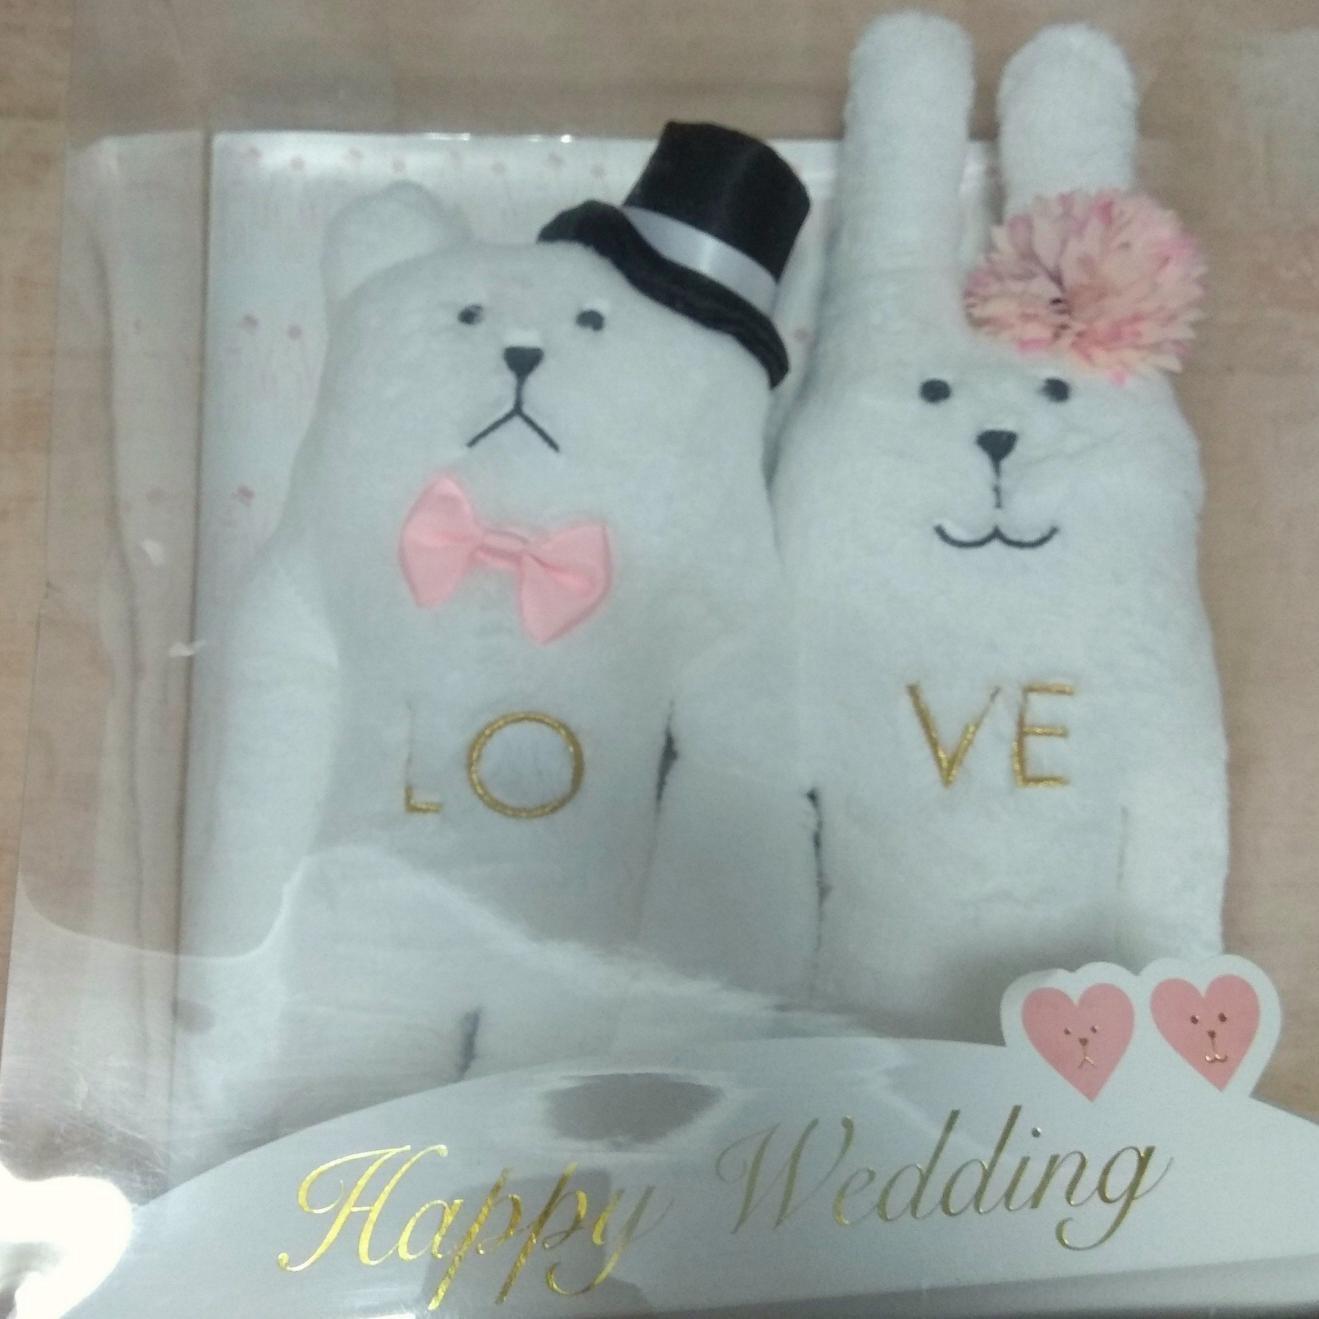 CRAFTHOLIC 宇宙人 結婚 禮盒 情人節 禮物 兔熊 擺飾 玩偶